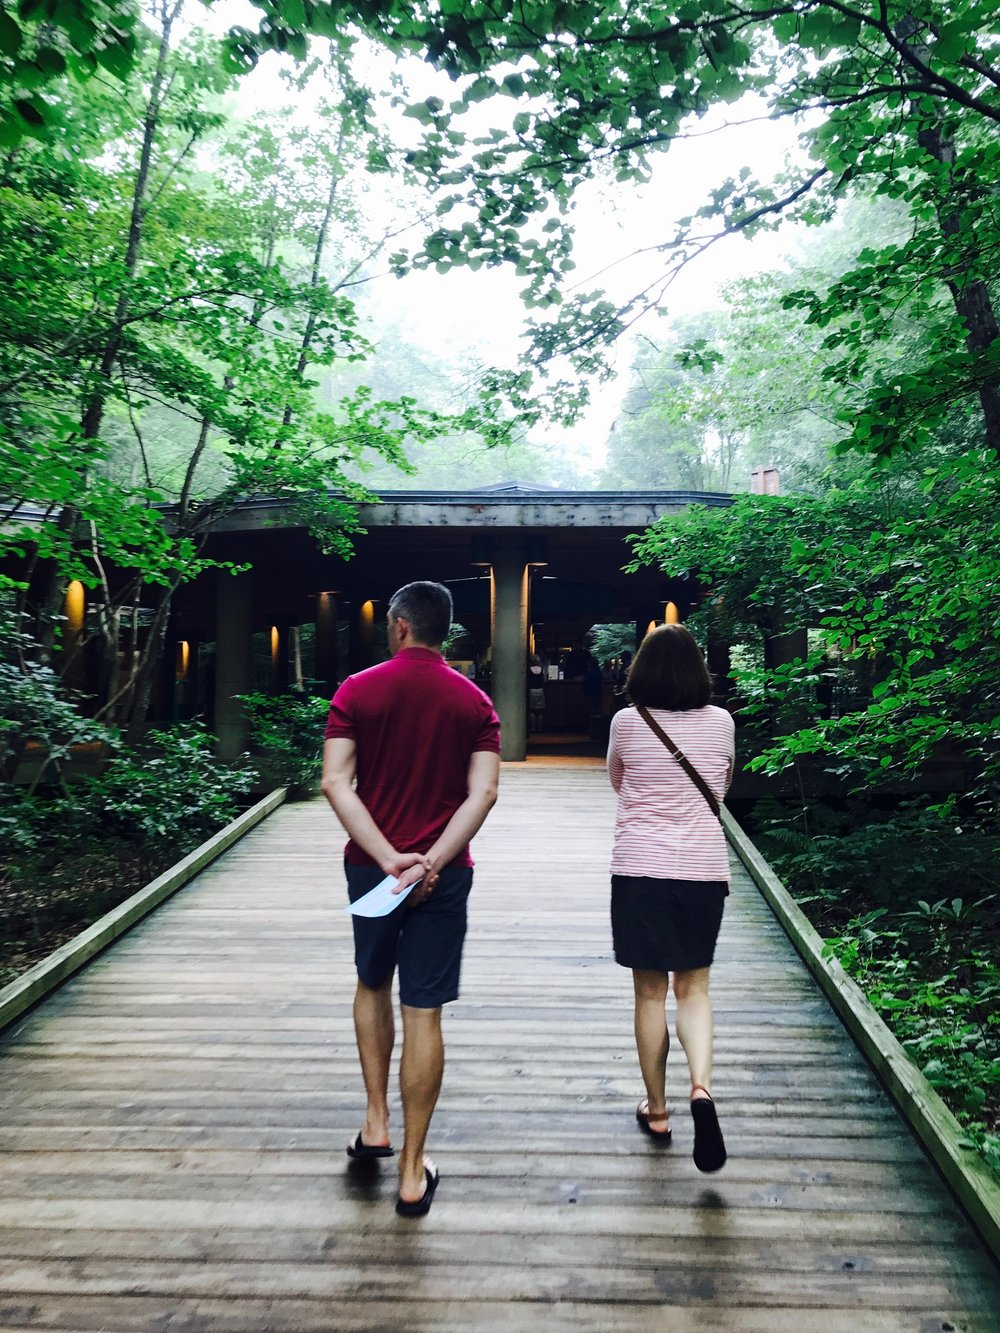 John and Susan entering Fallingwater